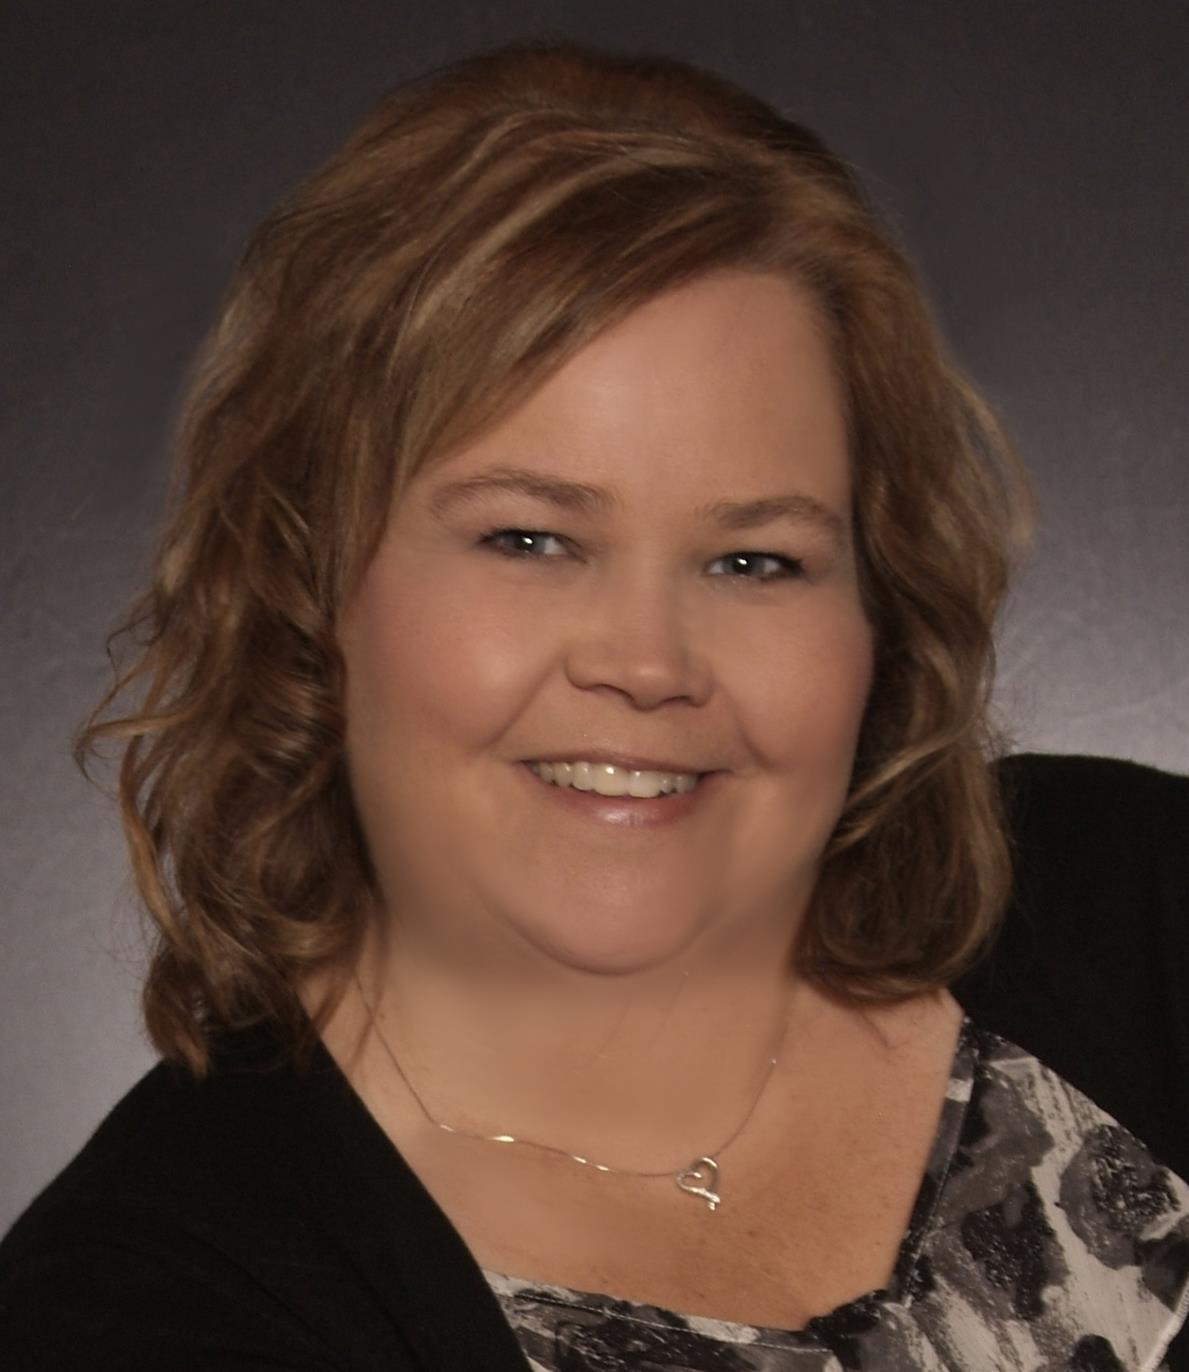 Amanda Amanda is a licensed real estate agent in Festus MO